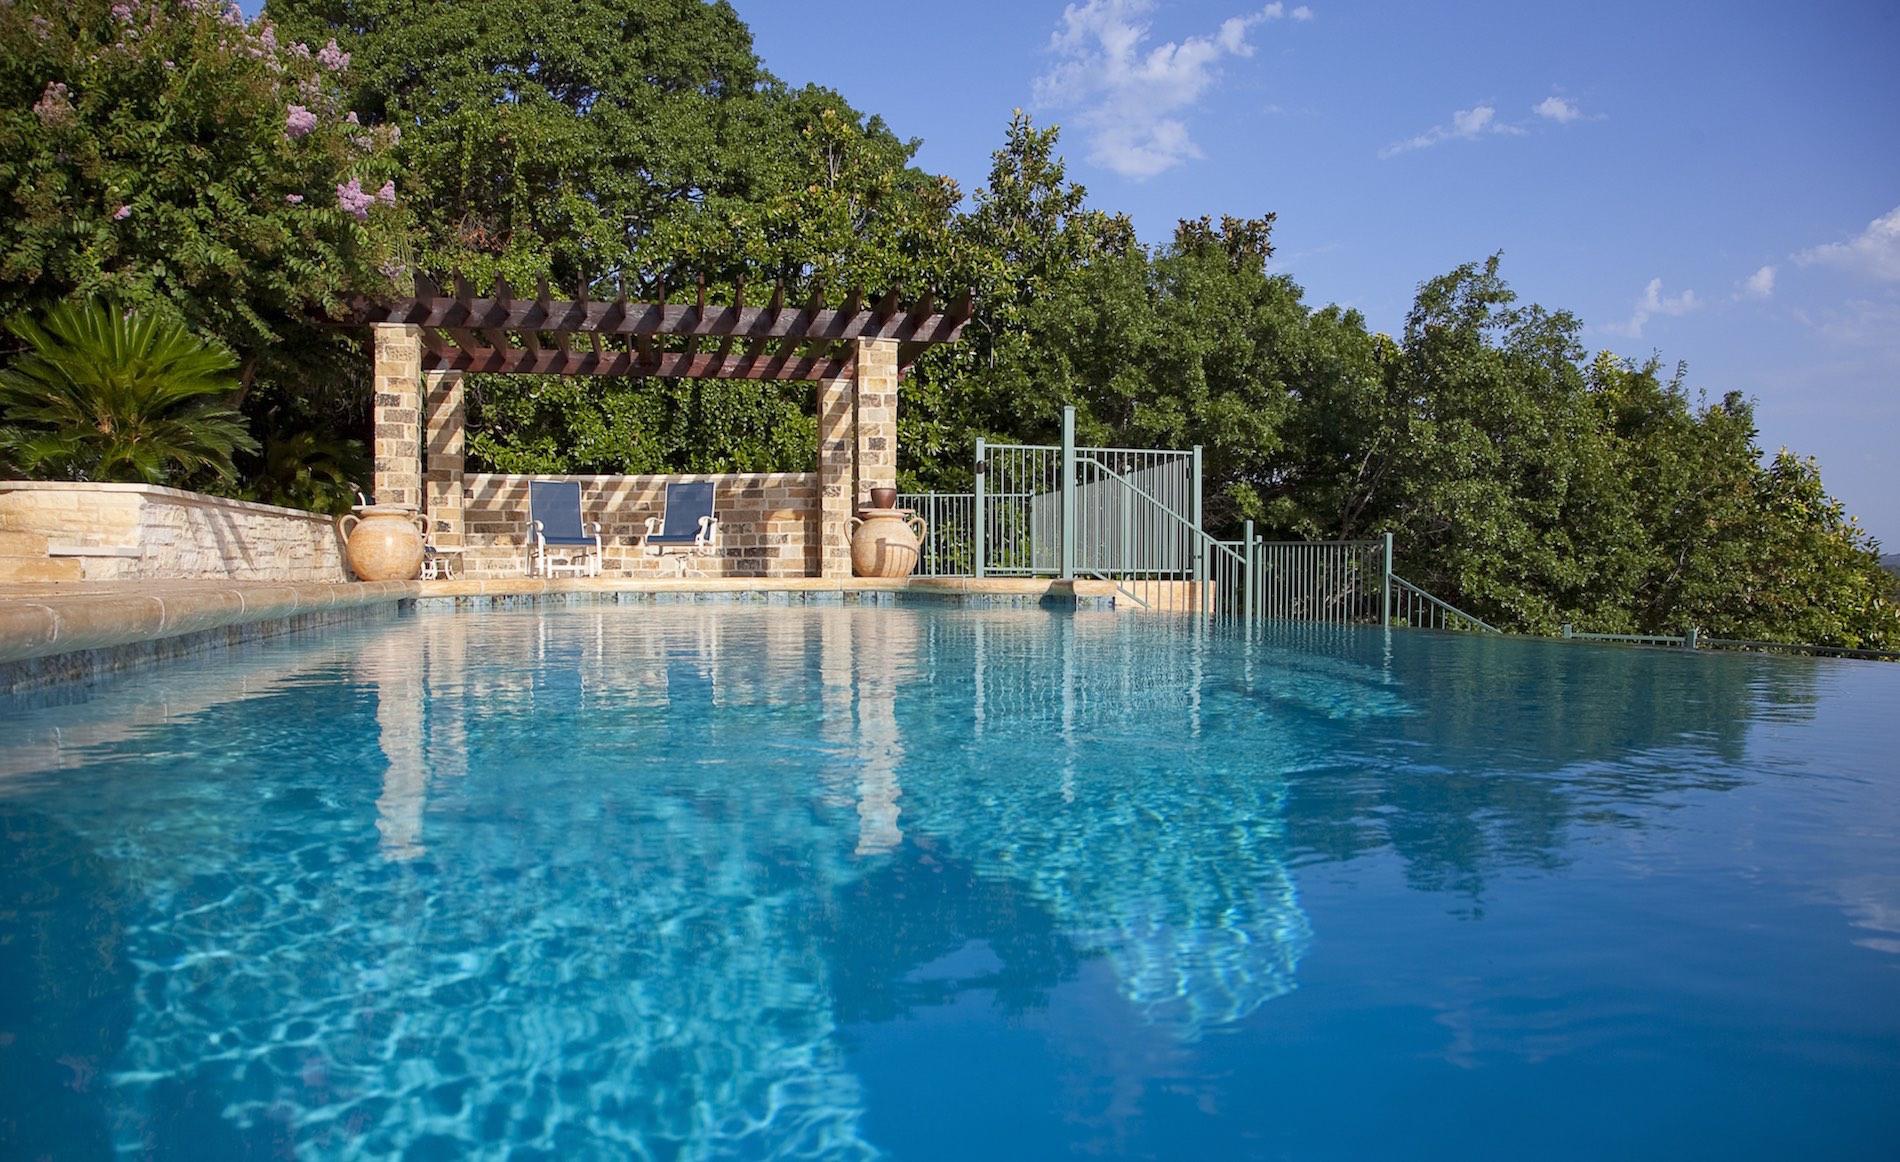 Custom In Ground Swimming Pools  Pool Repair  much more